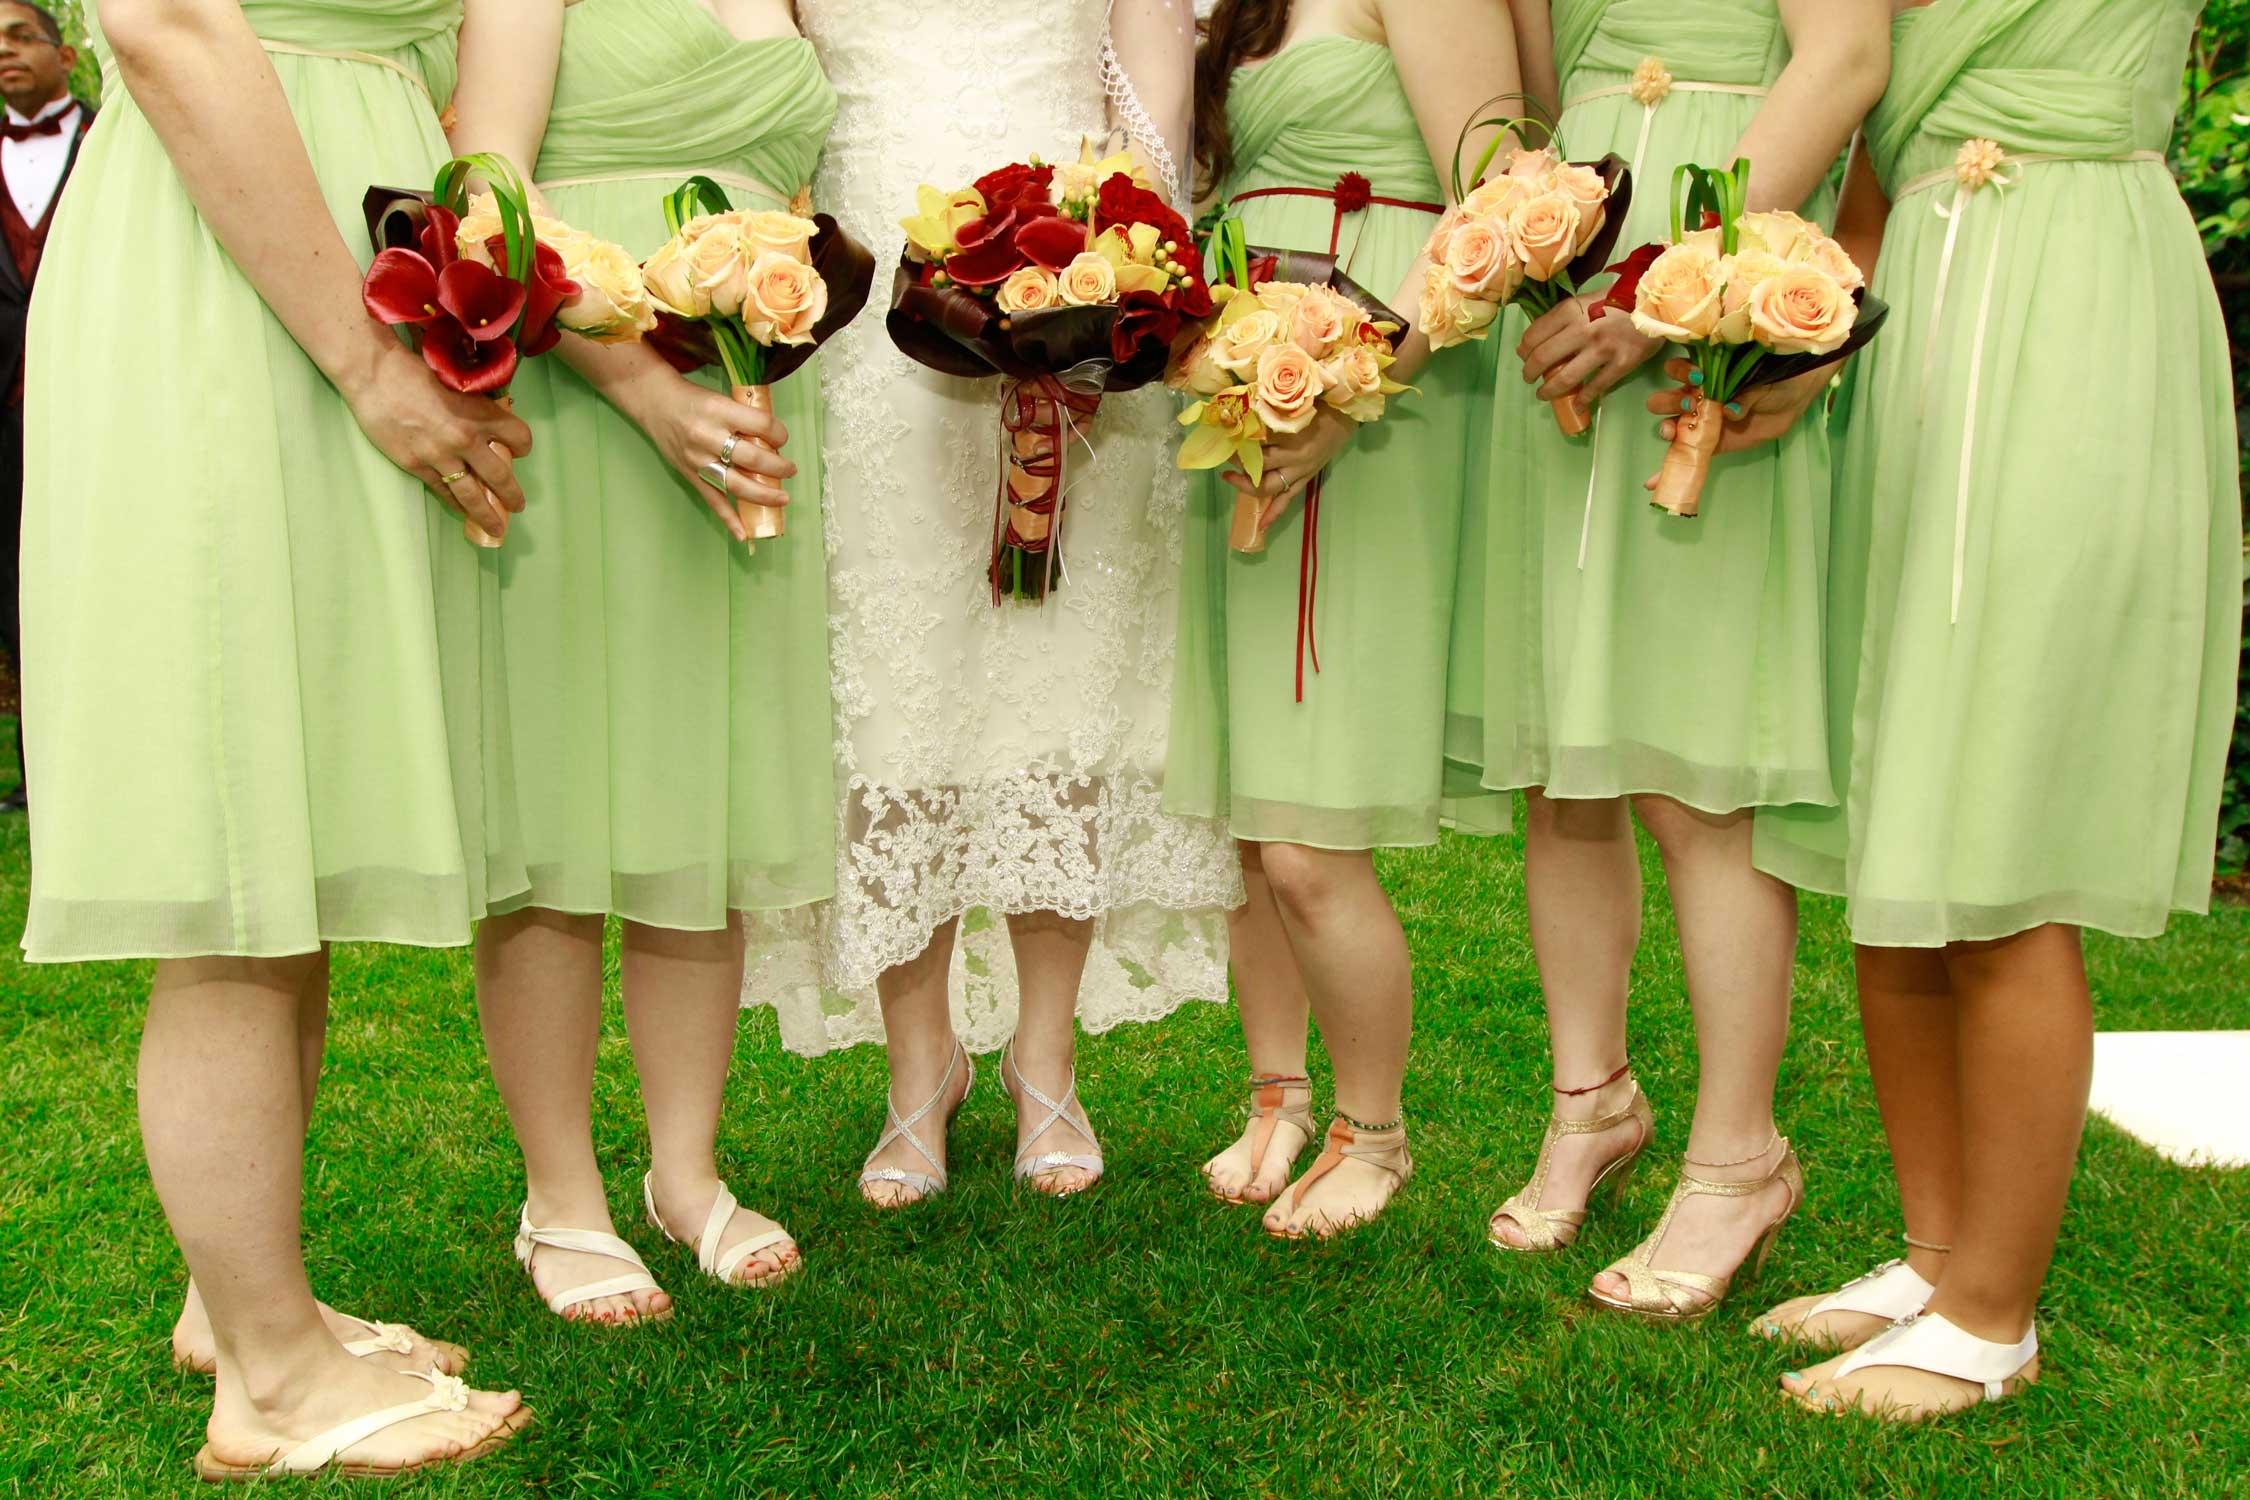 Latin bride & bridesmaids line up